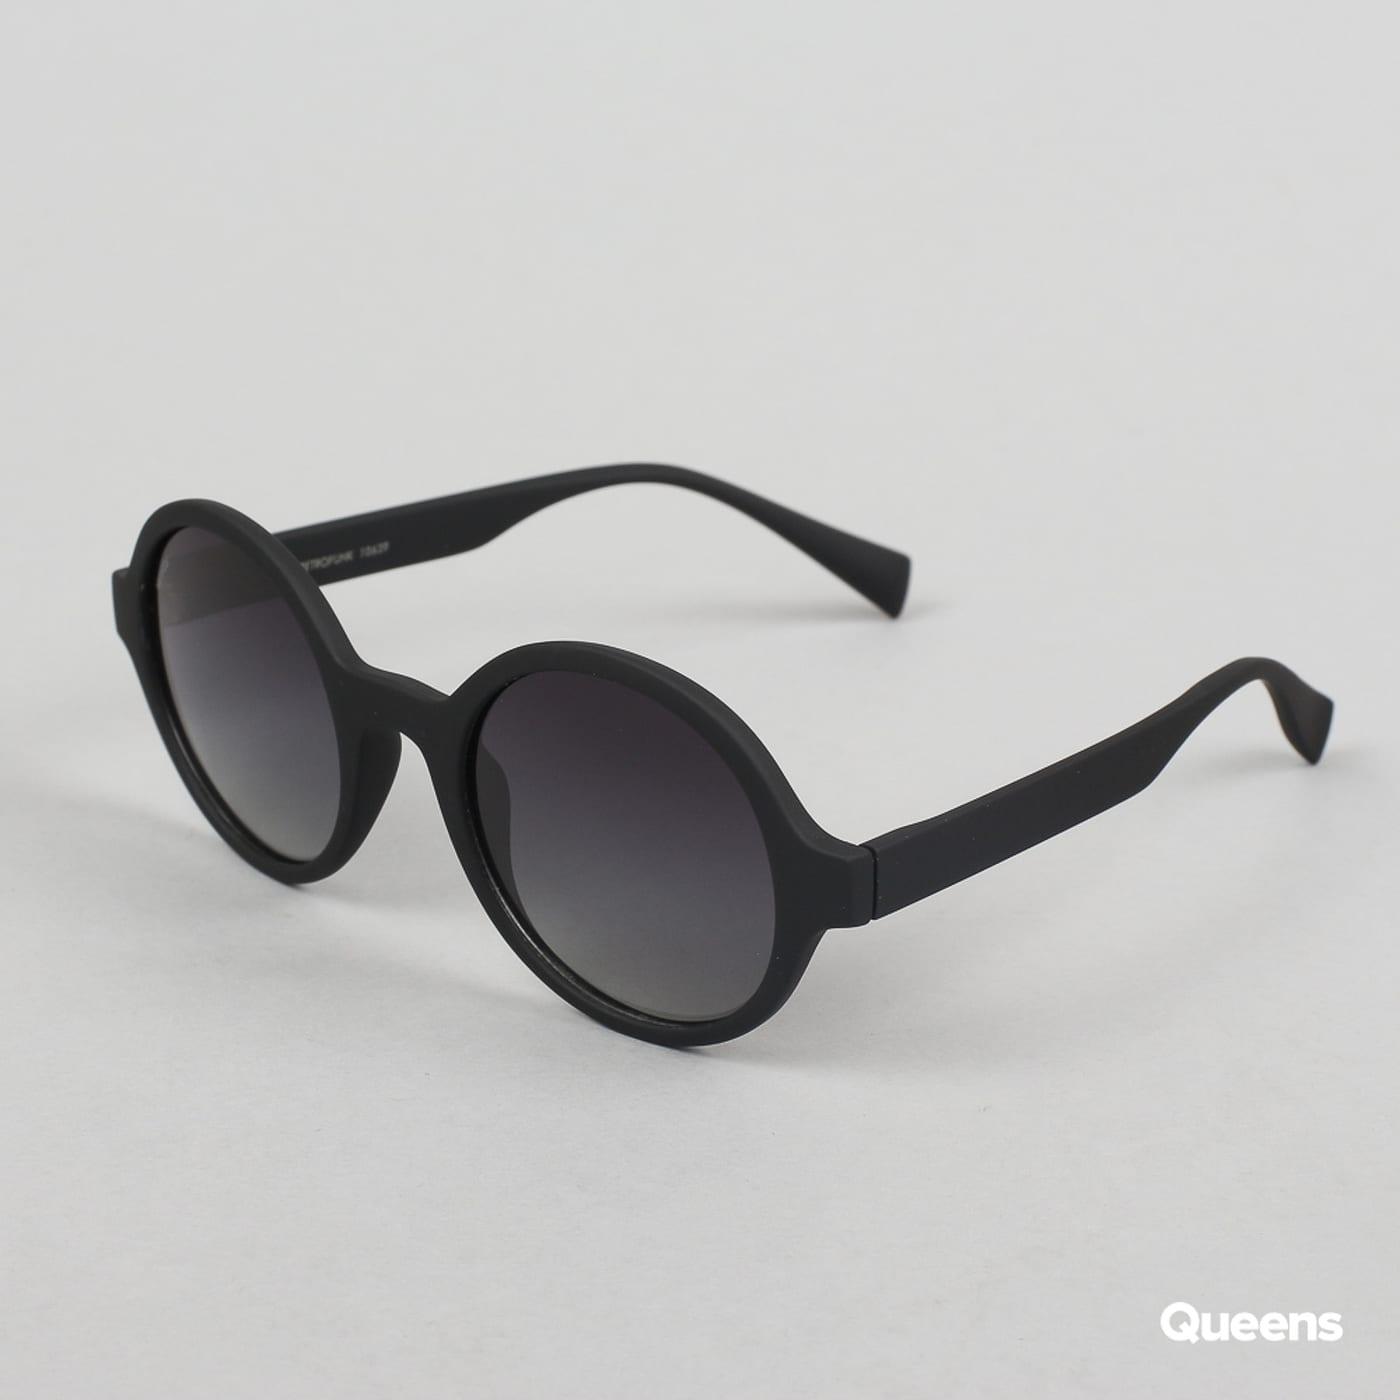 MD Sunglasses Retro Funk schwarz / grau